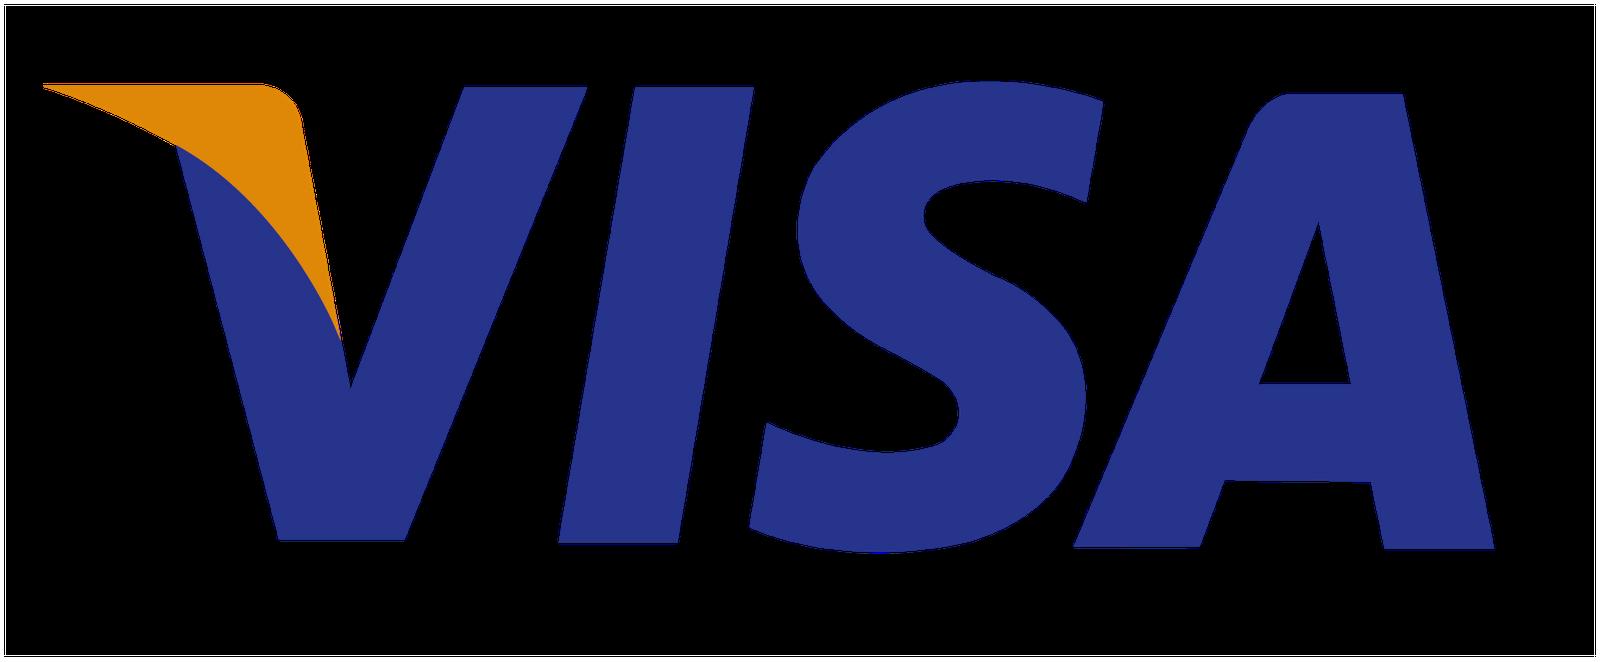 visa hd transparent logo #2019